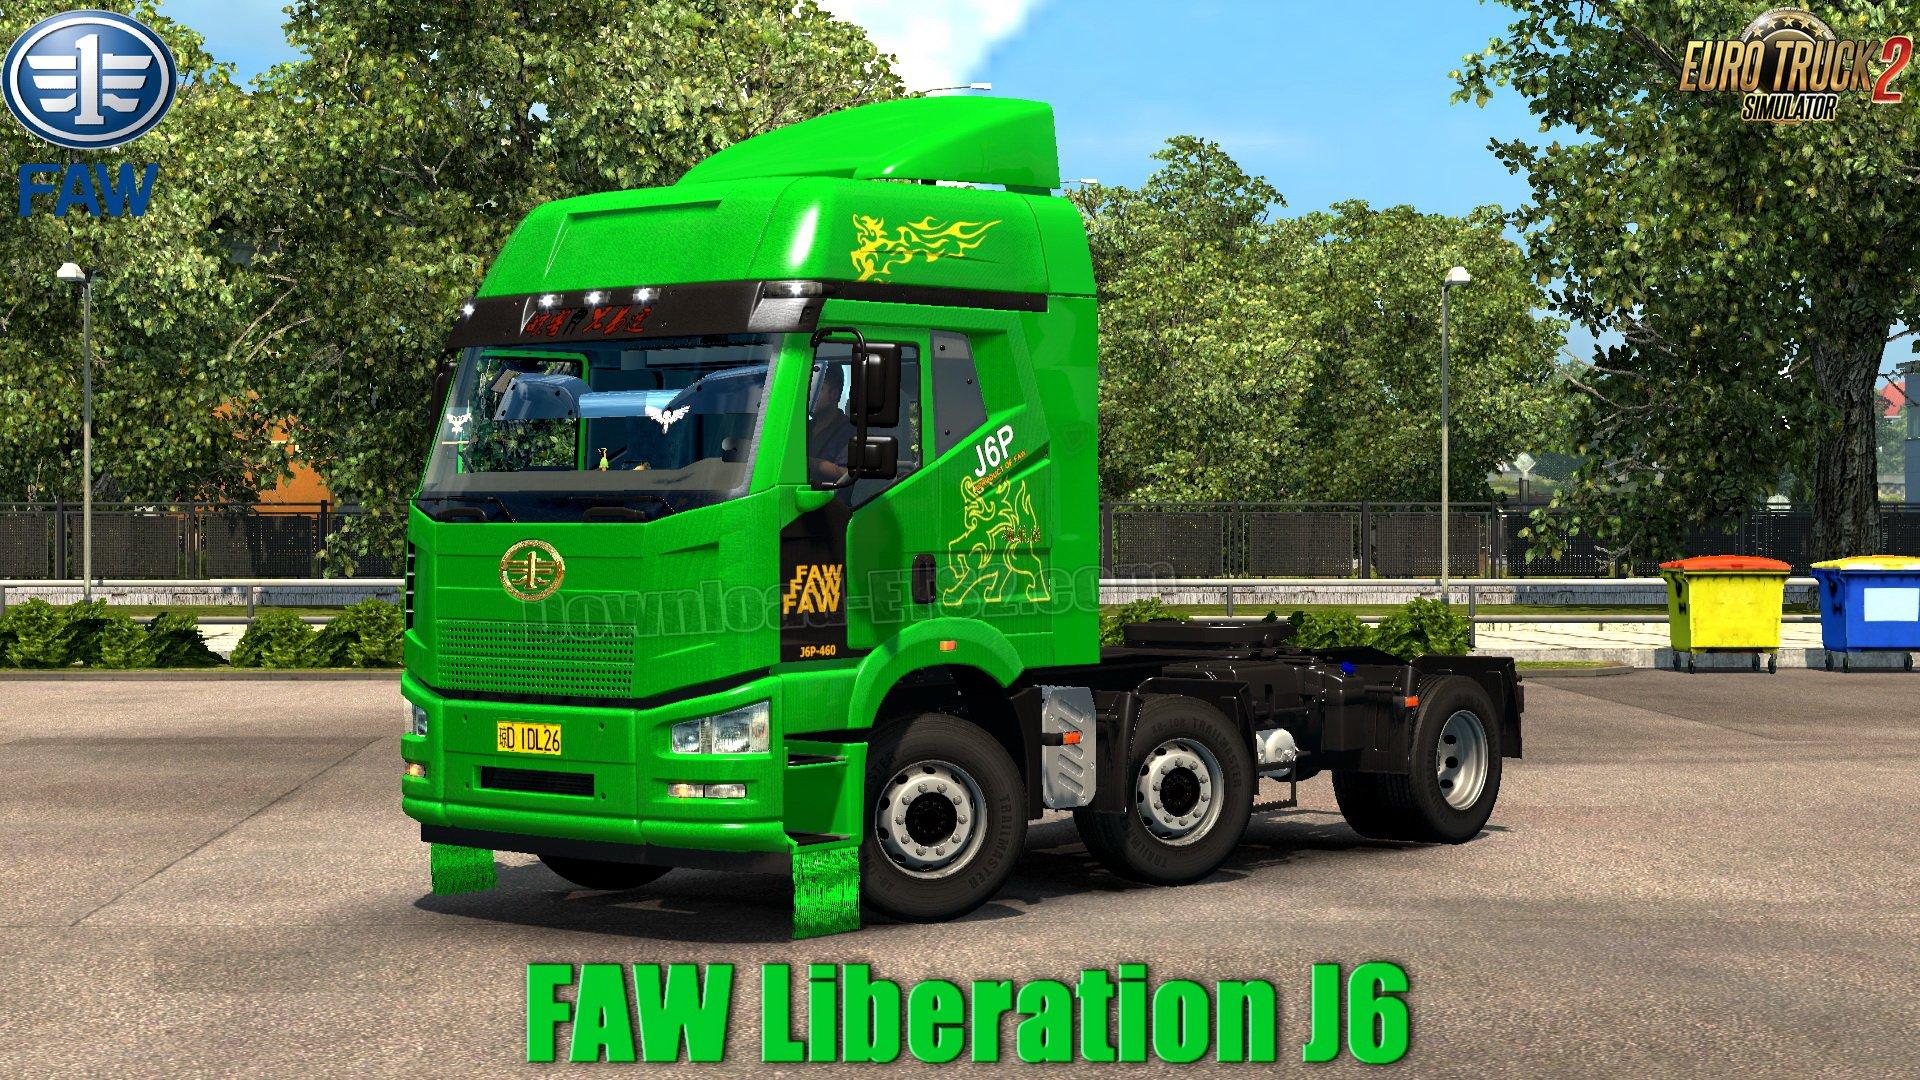 FAW Liberation J6 v1.0 (1.31.x)